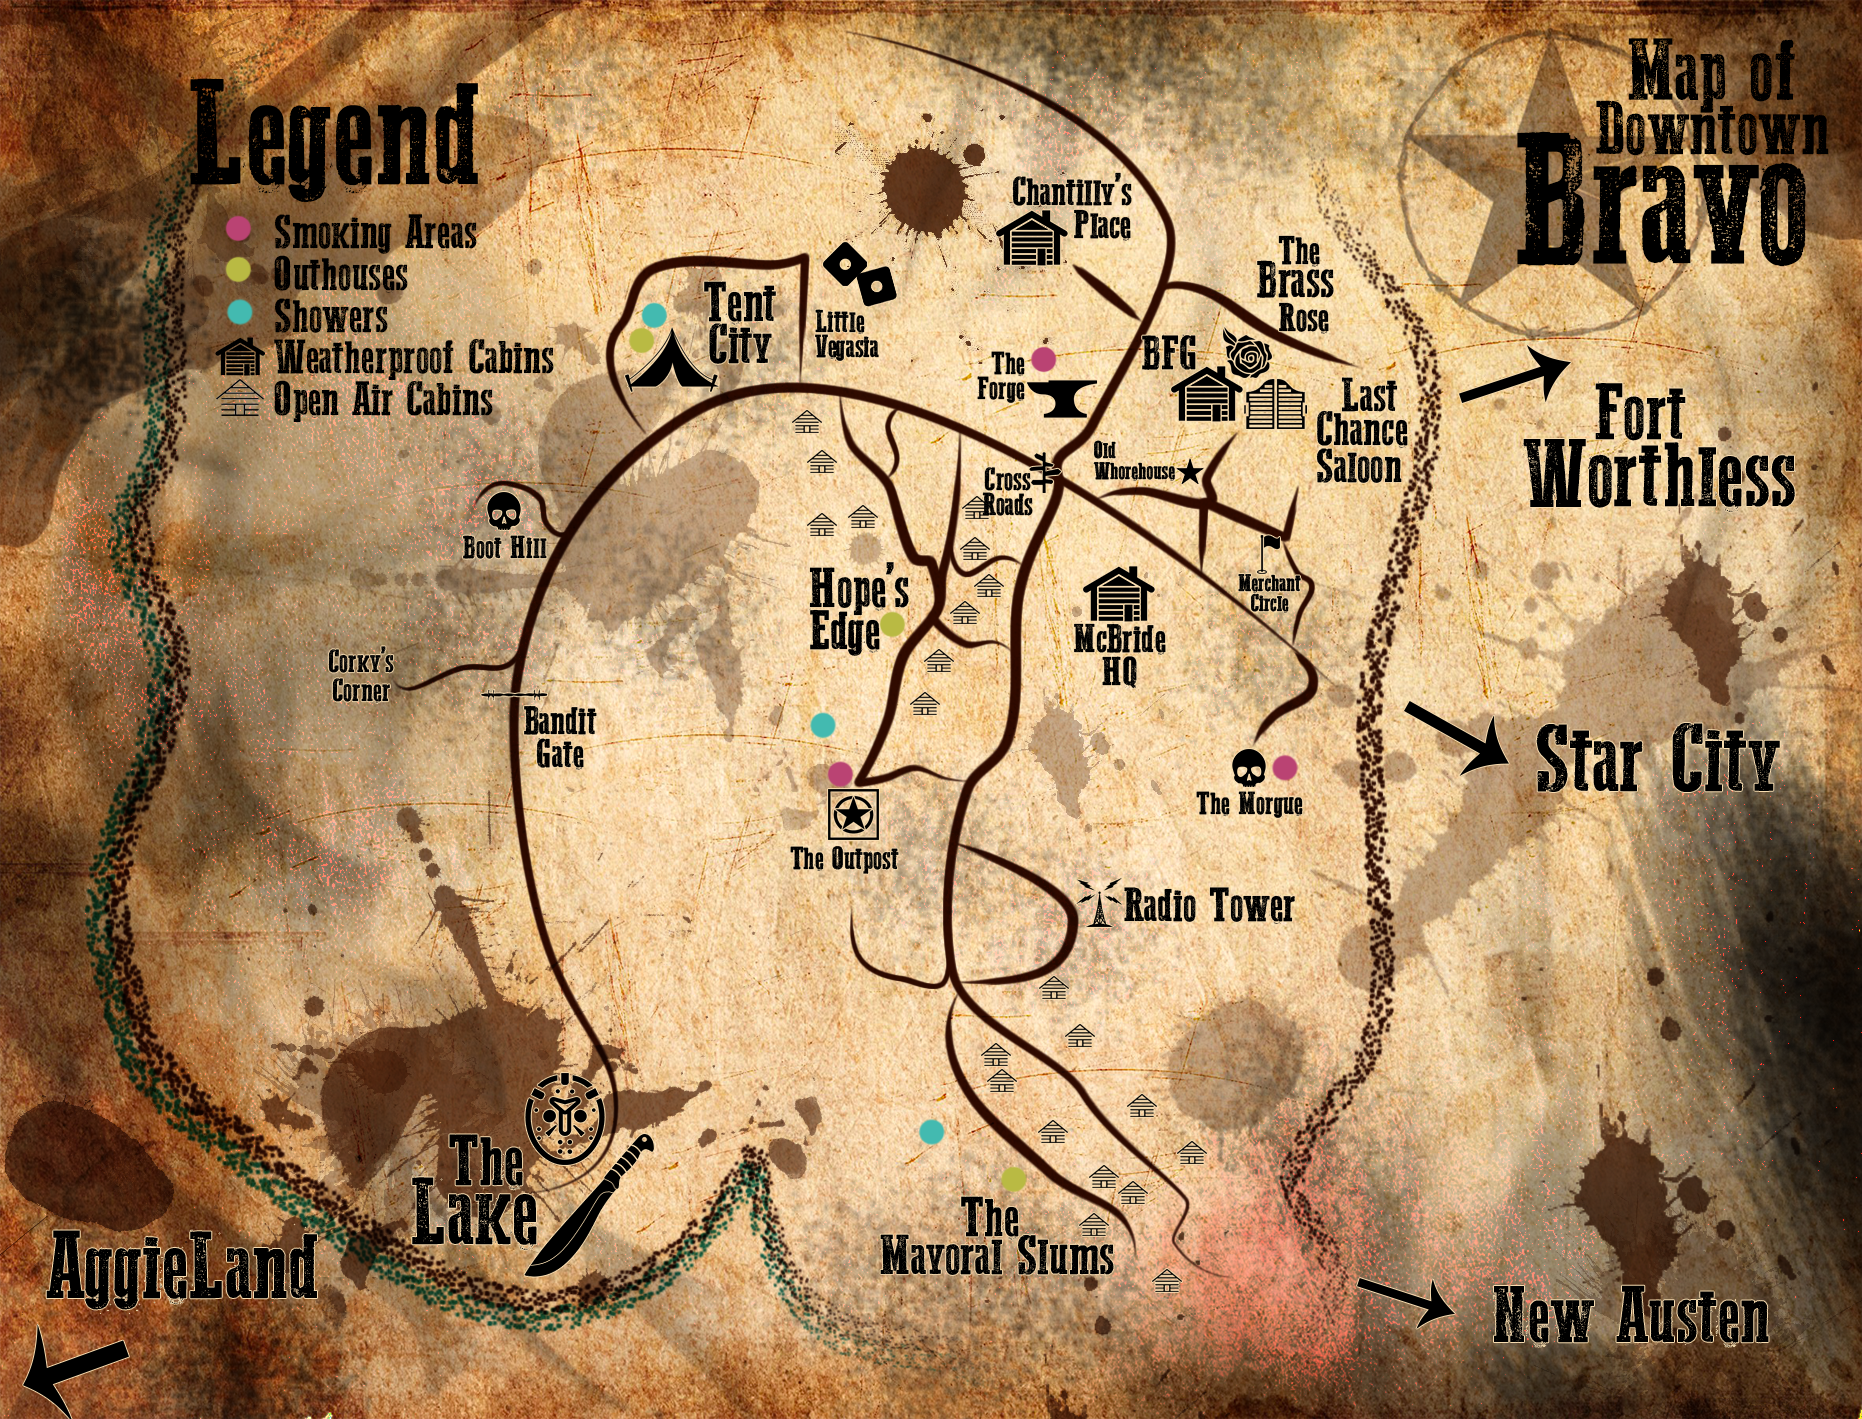 A complete map of Bravo, courtesy of Theresa Garcia and Anastasia Marston